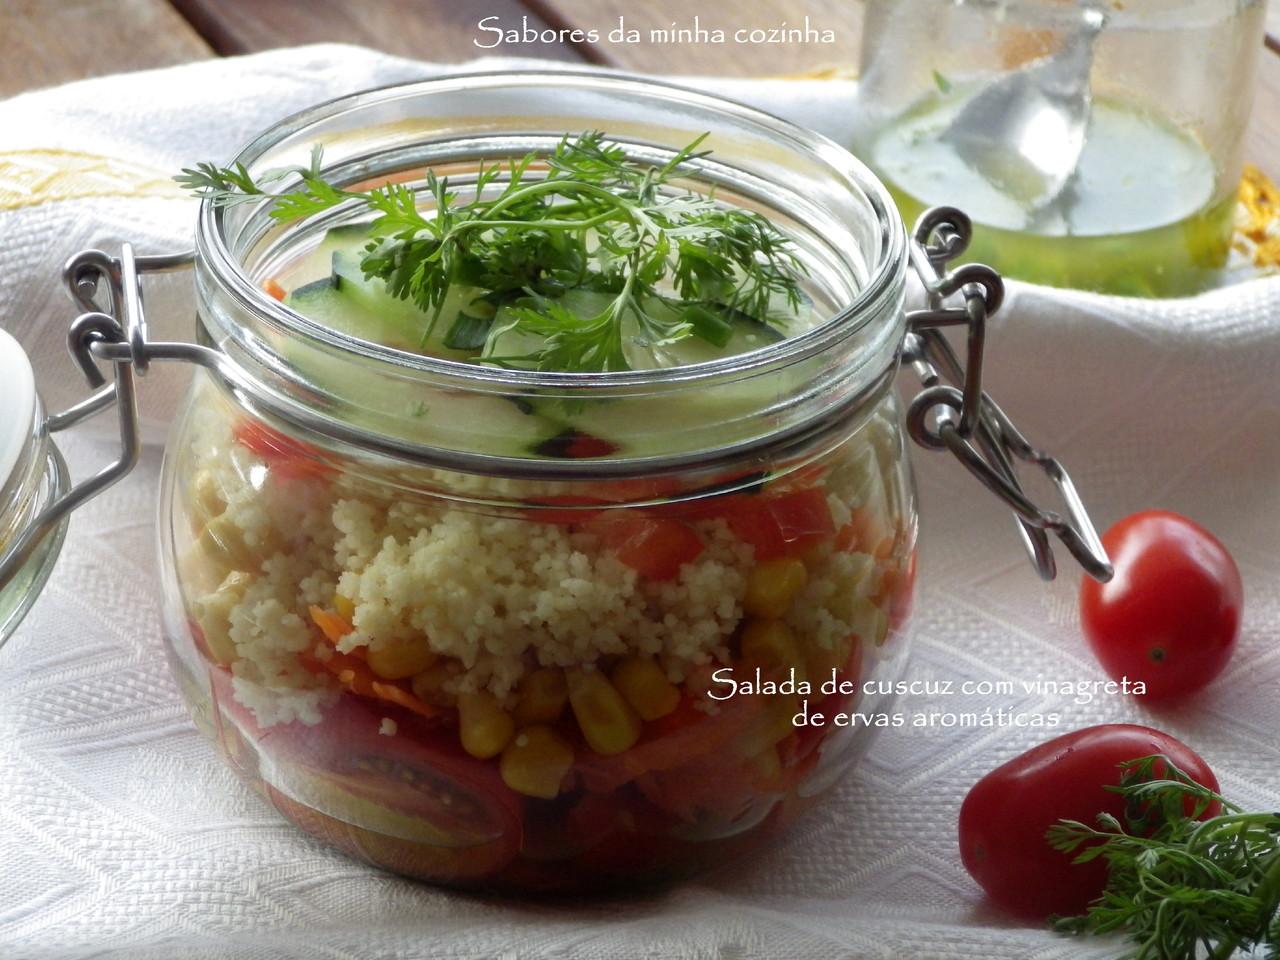 IMGP4886-Salada de cuscuz-Blog.JPG